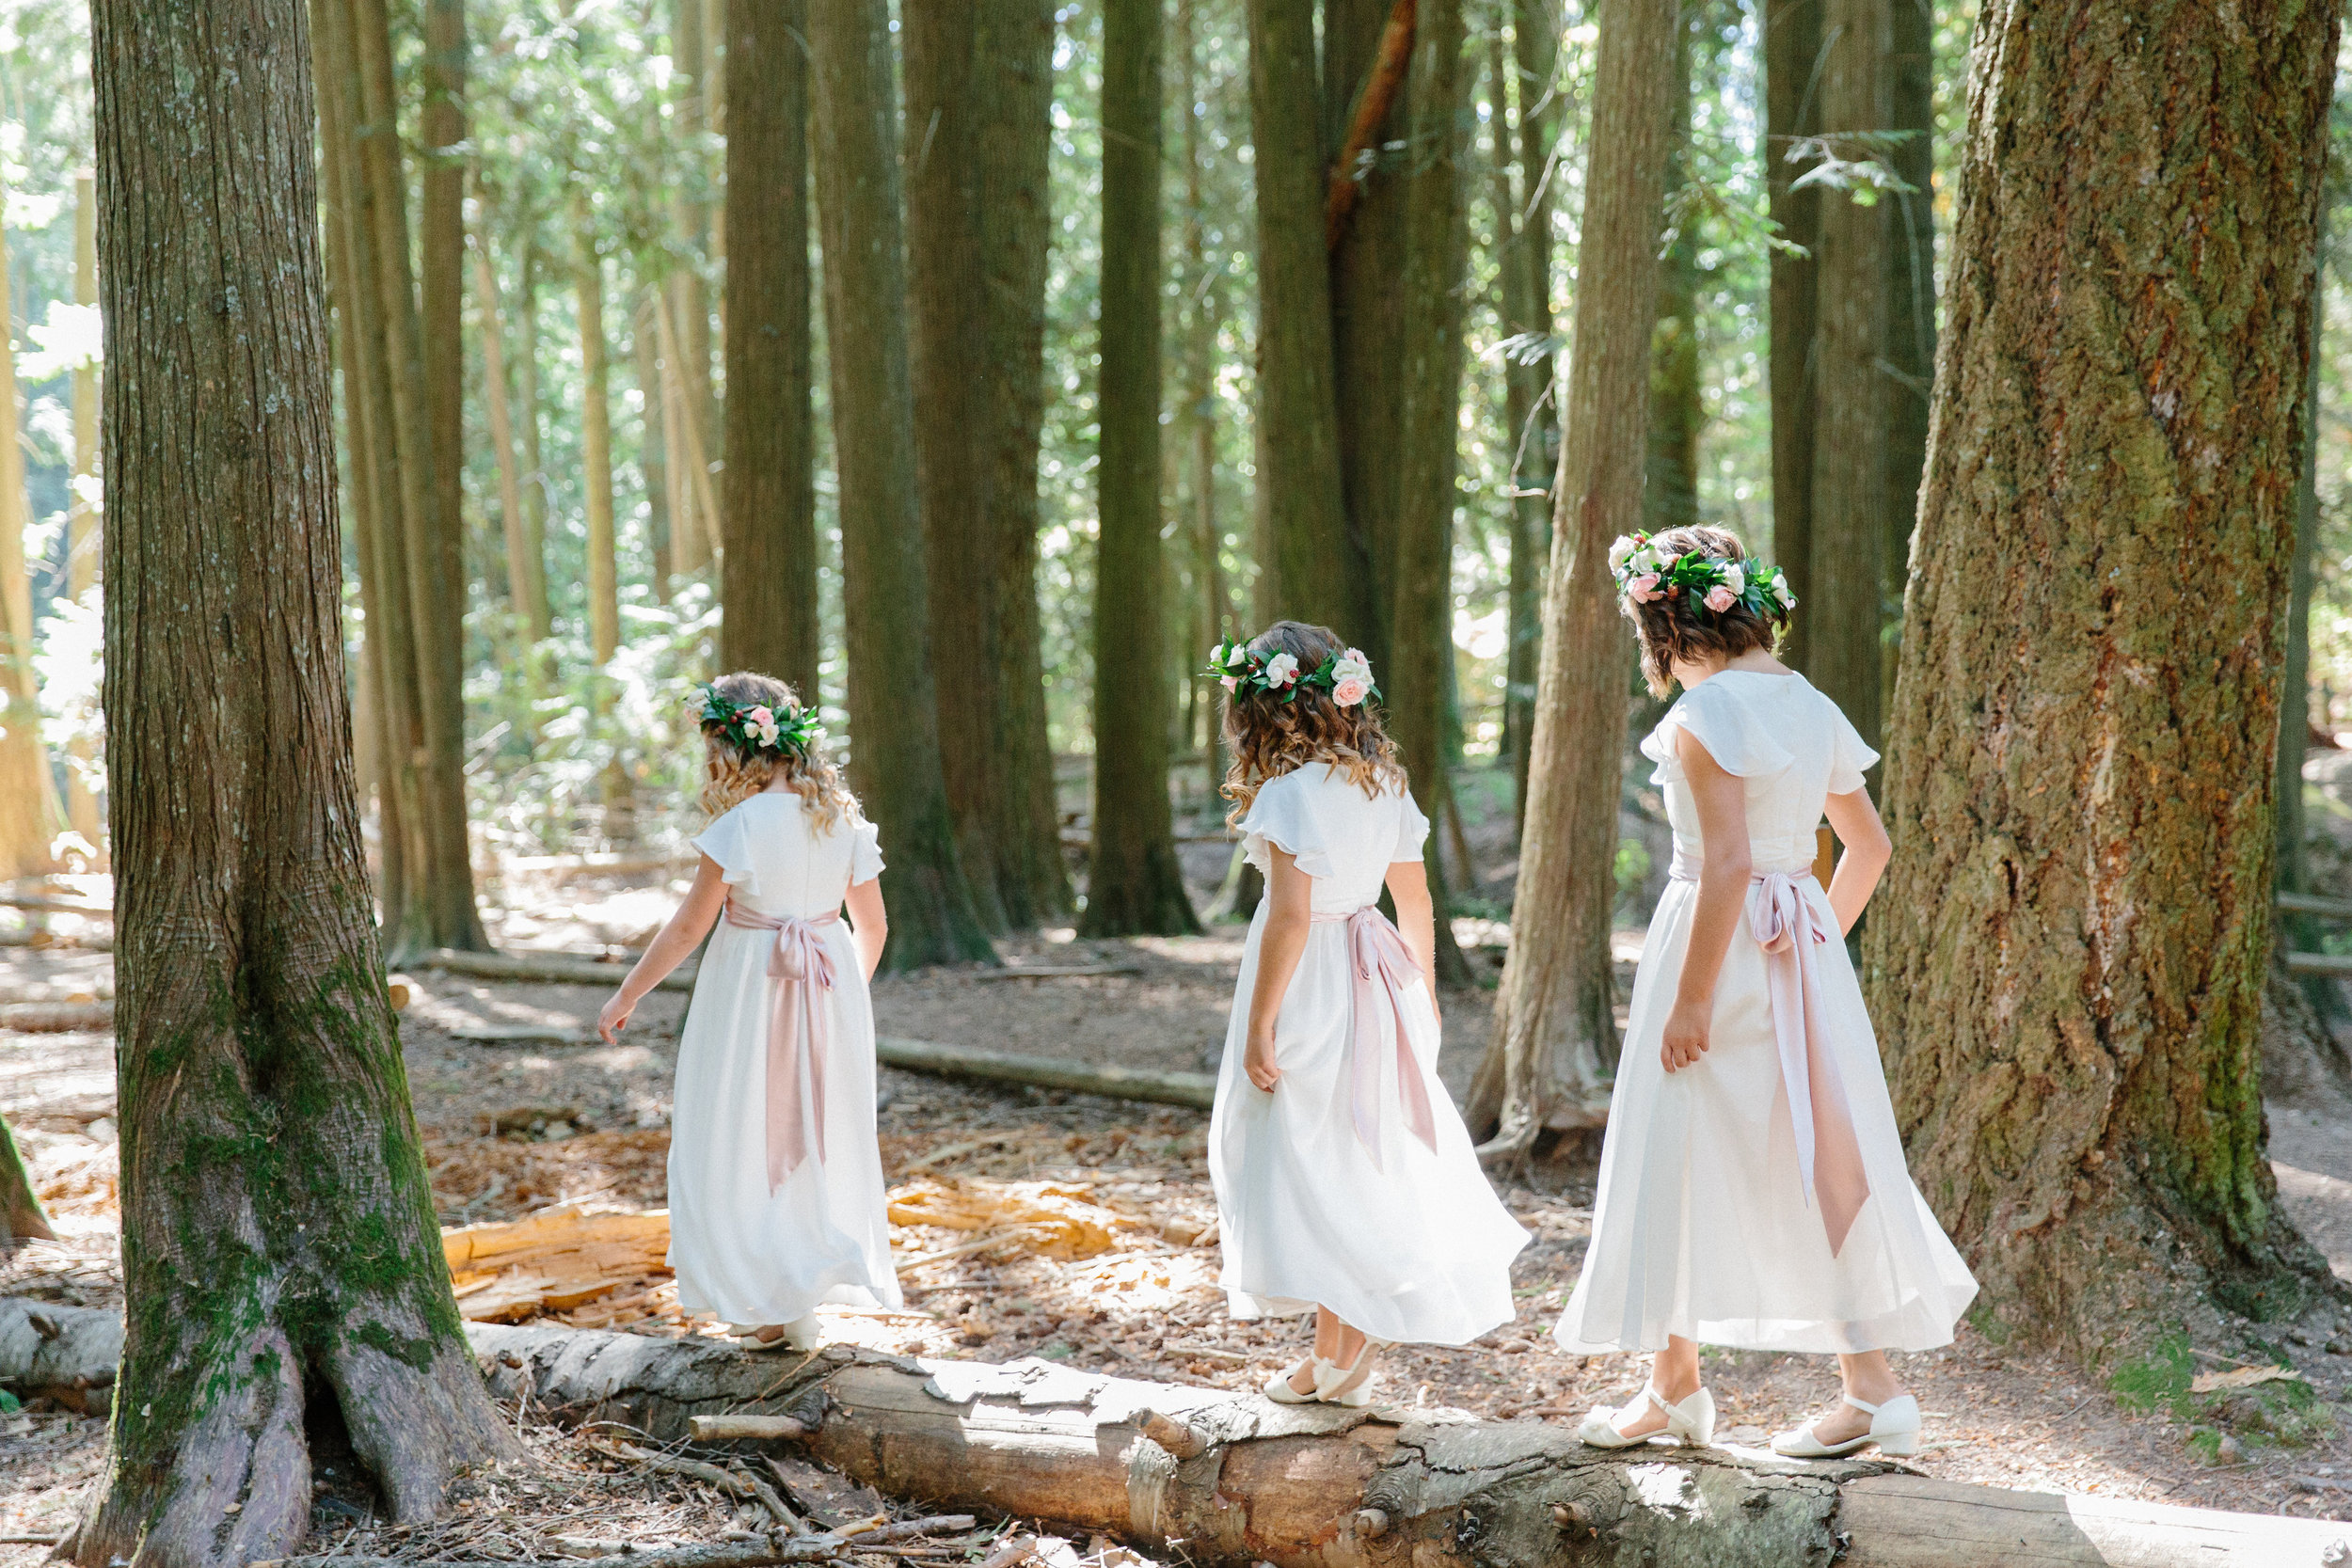 Idaho-Field-Forest-Wedding-Film-Photographer-Kristina-Adams-258.jpg